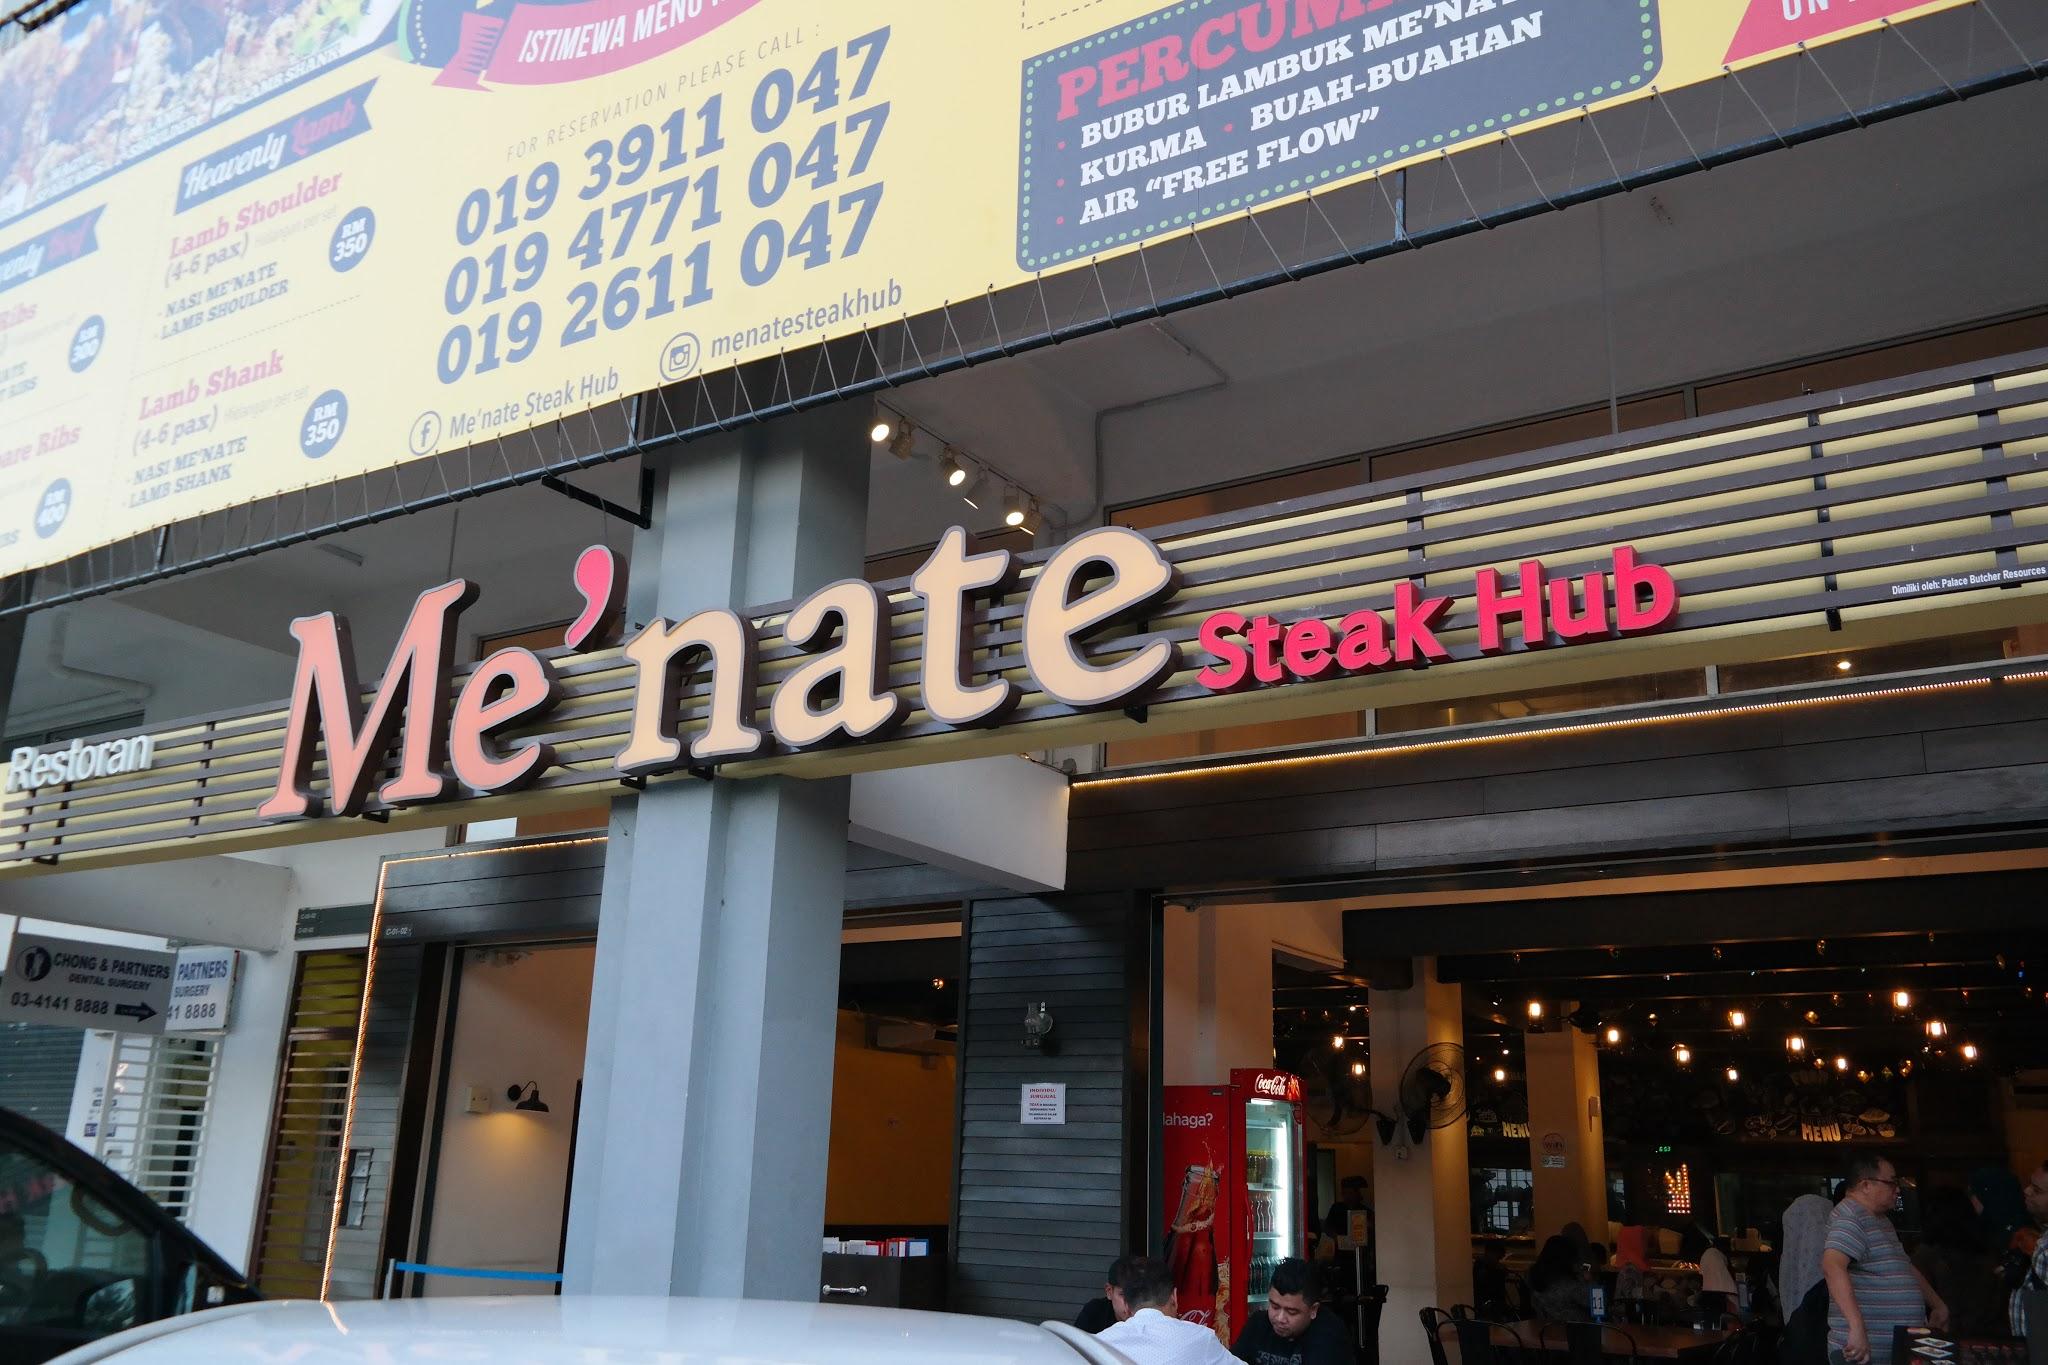 Ramadhan Special at Menate Steak Hub!, menate steak hub, best steak in KL, wagyu beef halal in malaysia, wagyu beef murah, cheap wagyu beef, restoran menate, menate mahal,